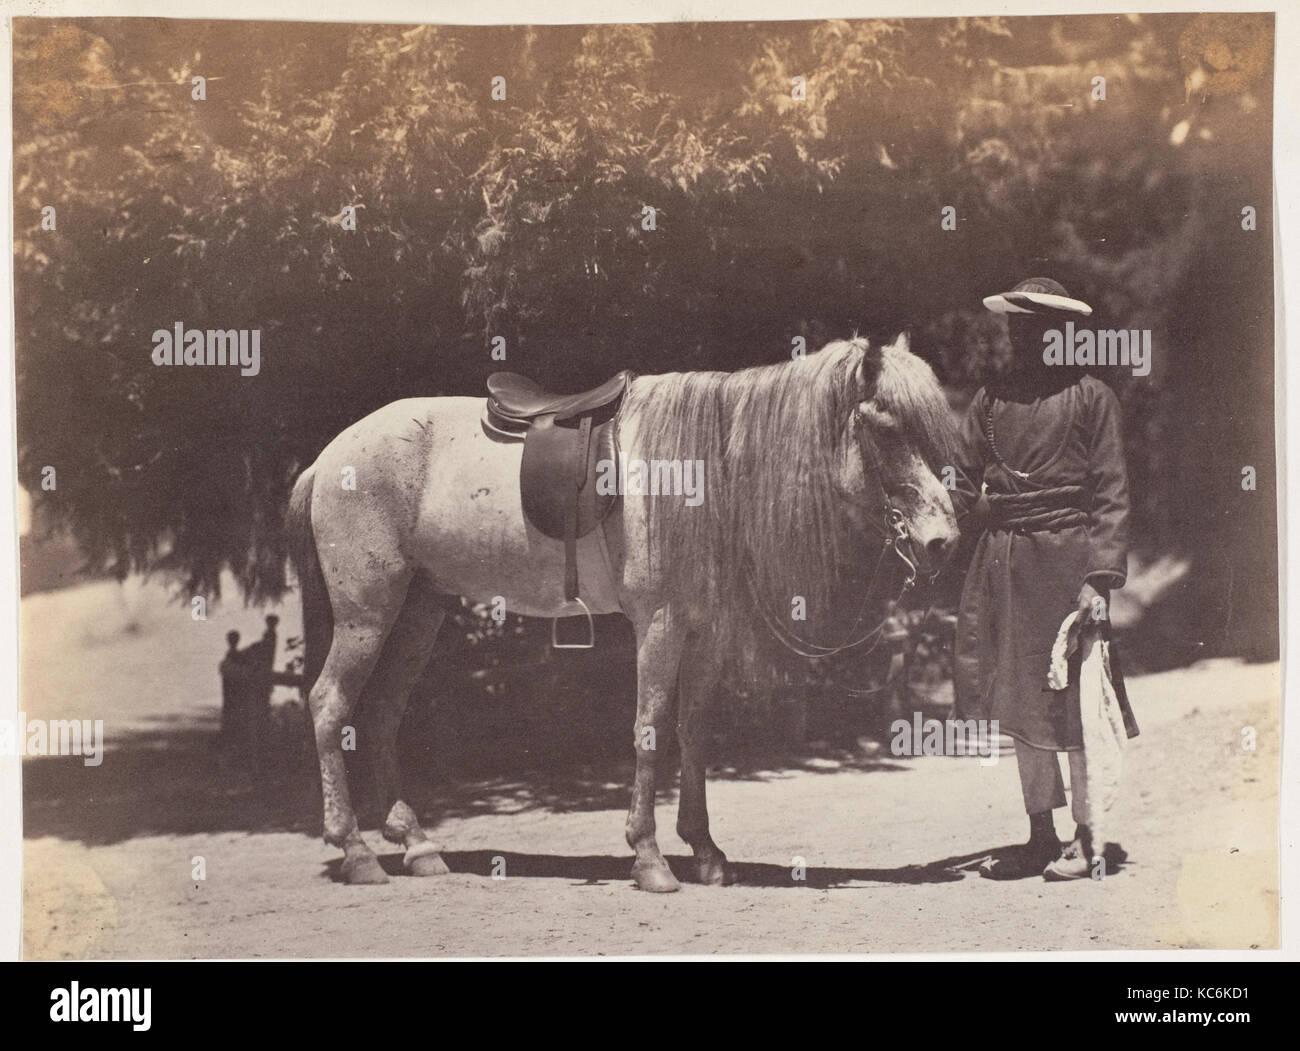 Lord canning Hill Pony, 1858-61, Eiweiß silber Drucken, Bild: 19,7 x 14,6 cm (7 3/4 x 5 3/4 in.), Fotografien, Stockbild